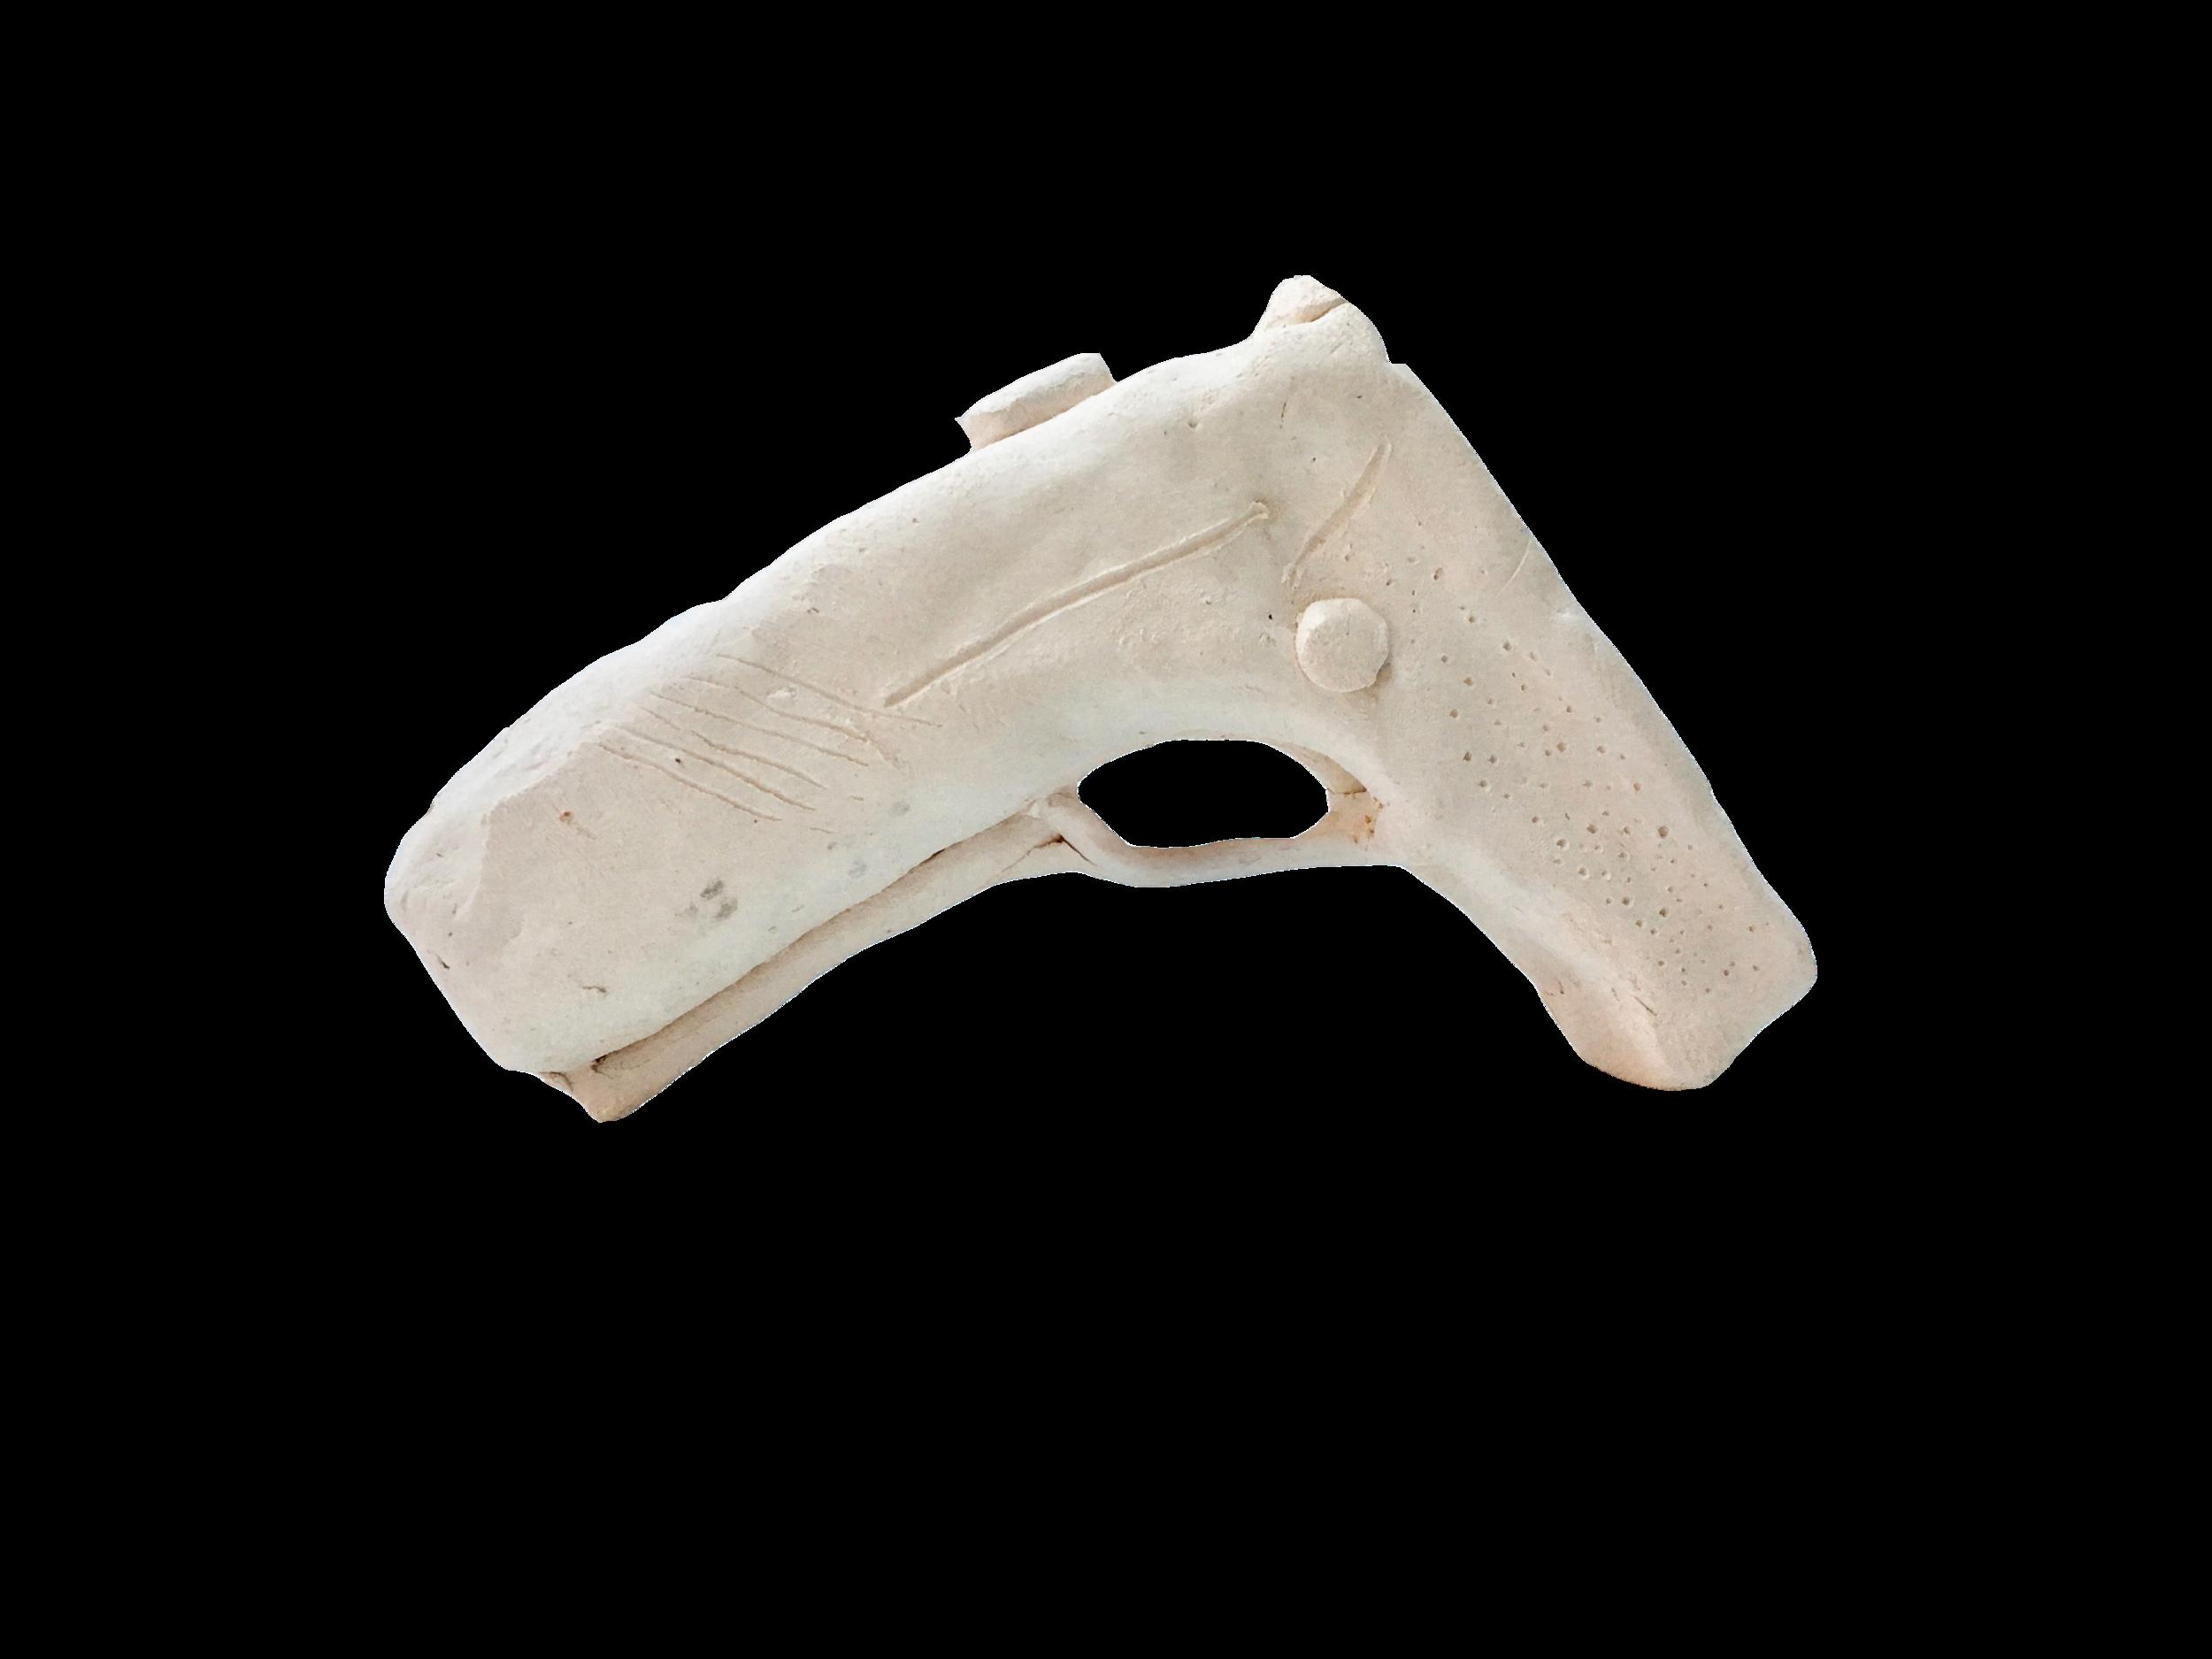 toy gun_BAMPFA_9.22.18_mechelini-catillo.png